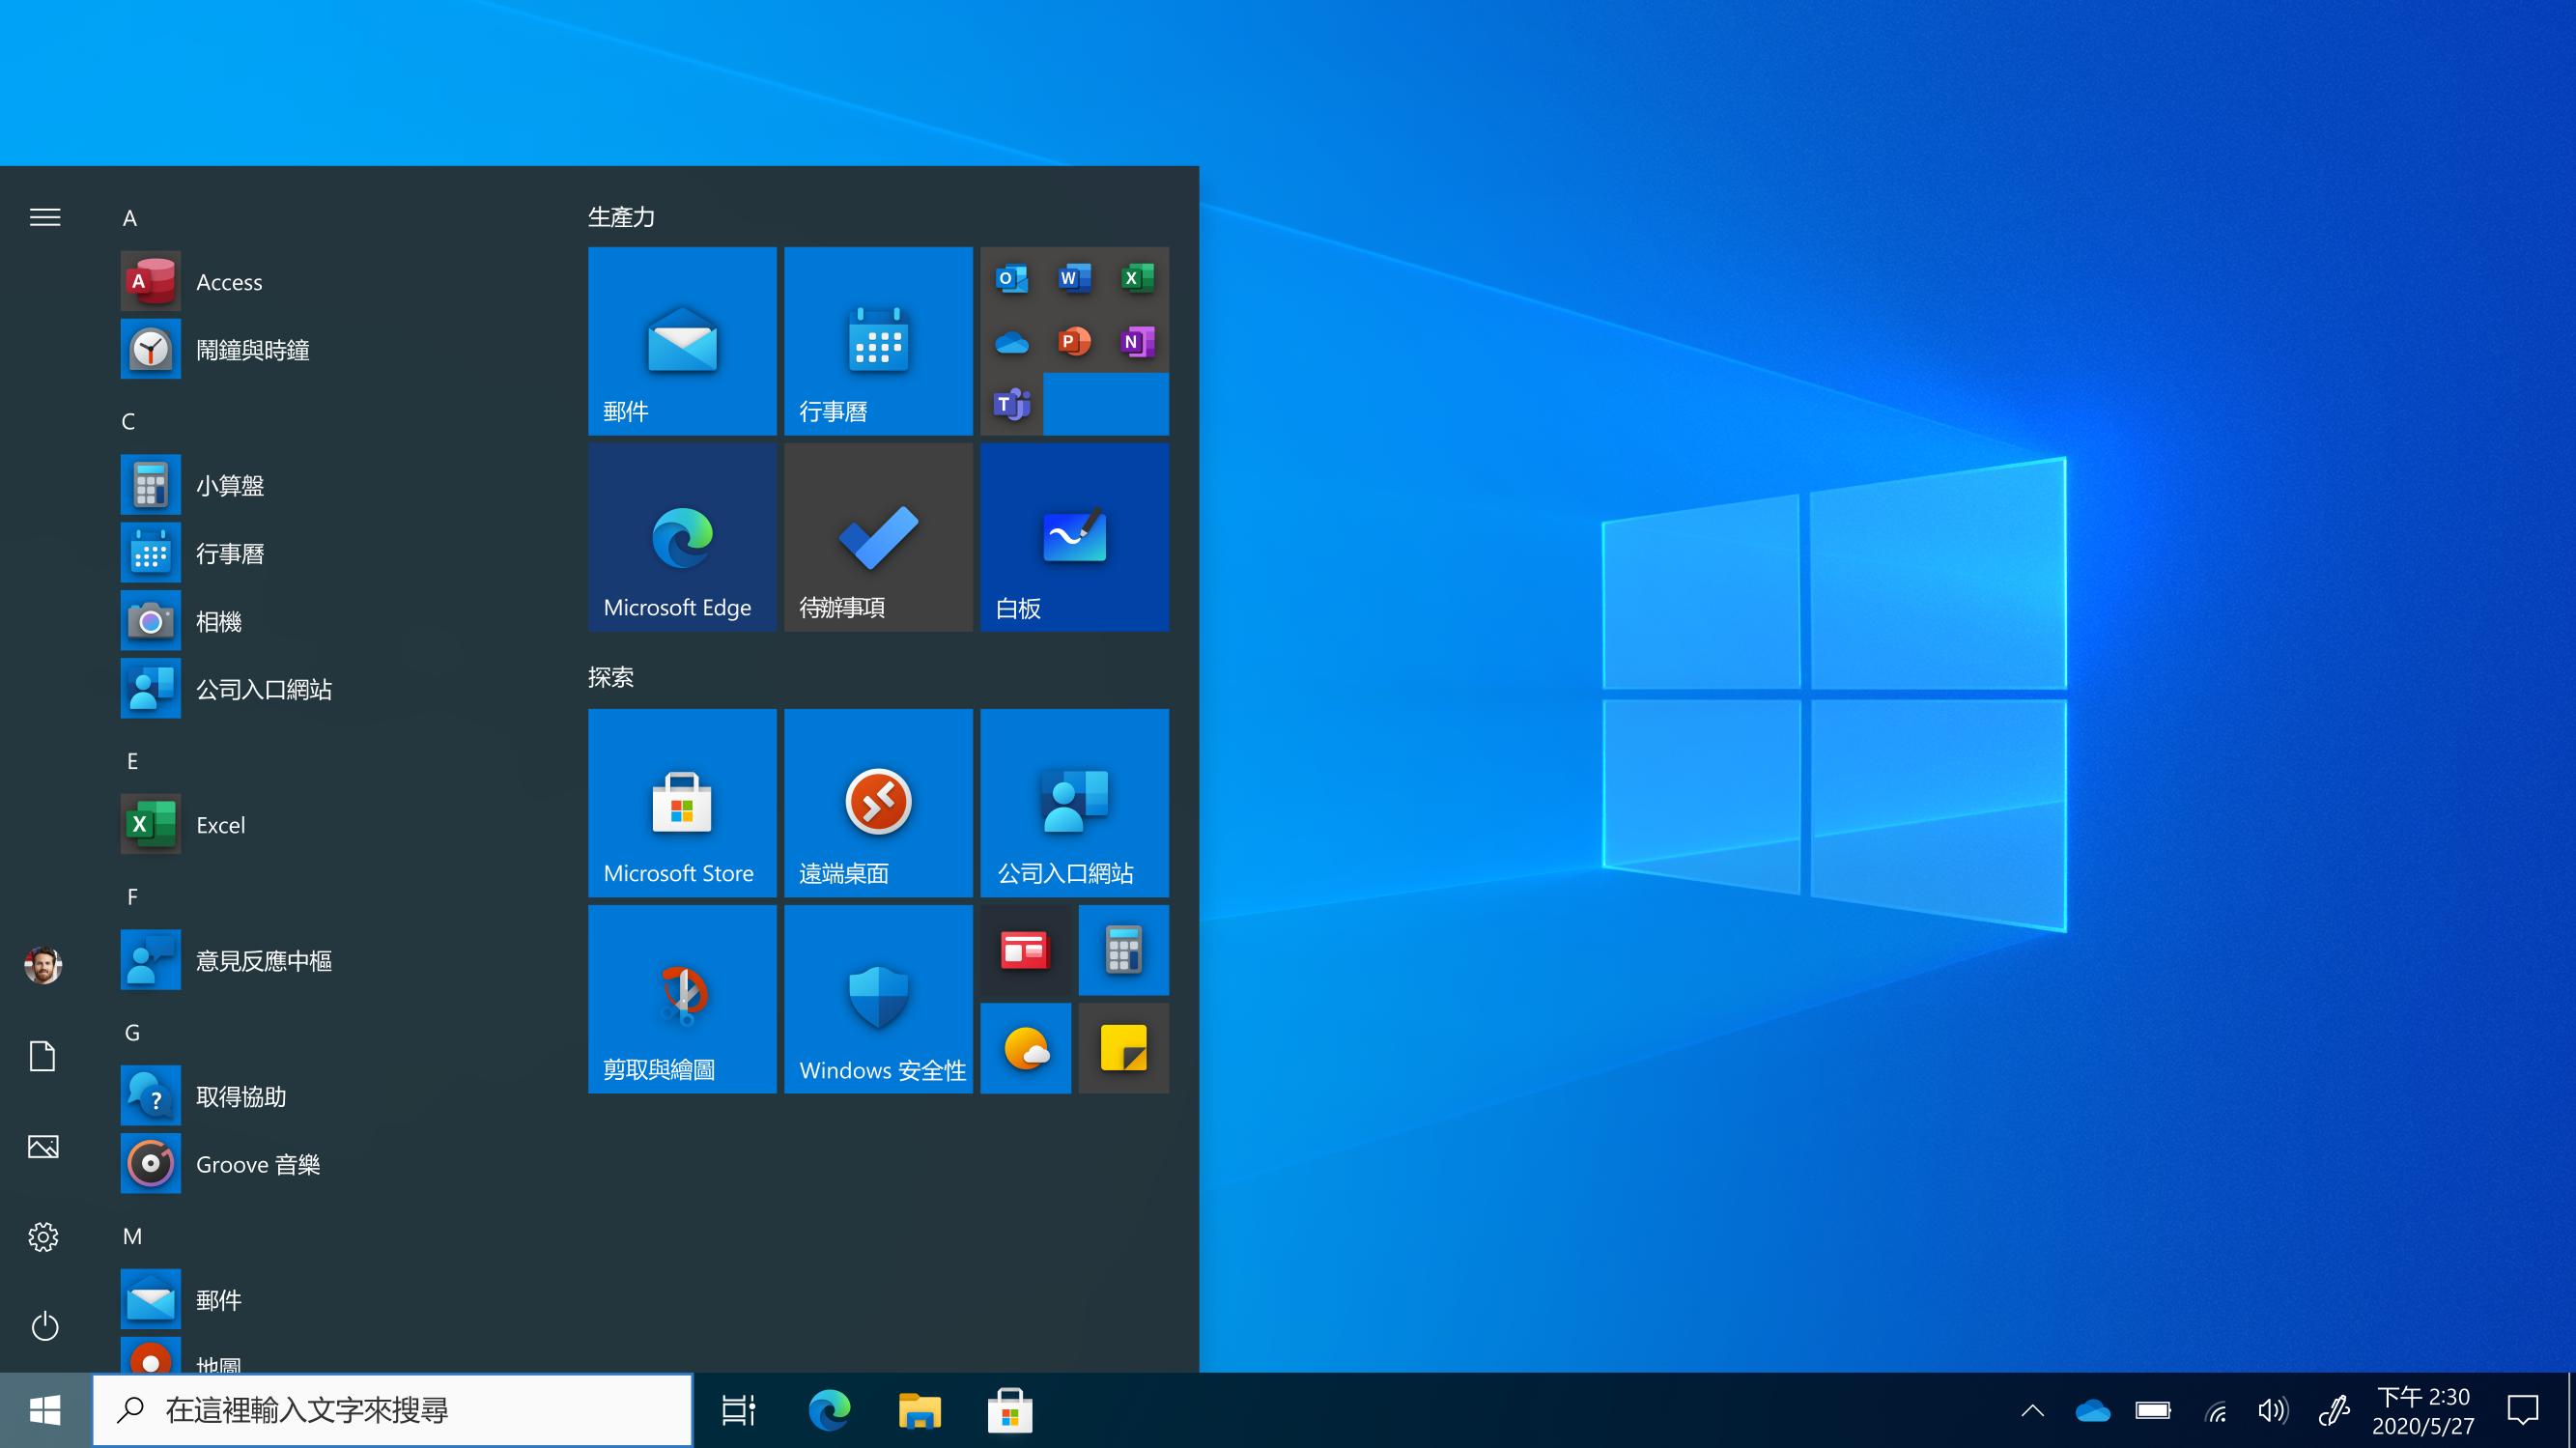 W10_20H1_CML_Laptop_Start_16x9_zh-TW.png